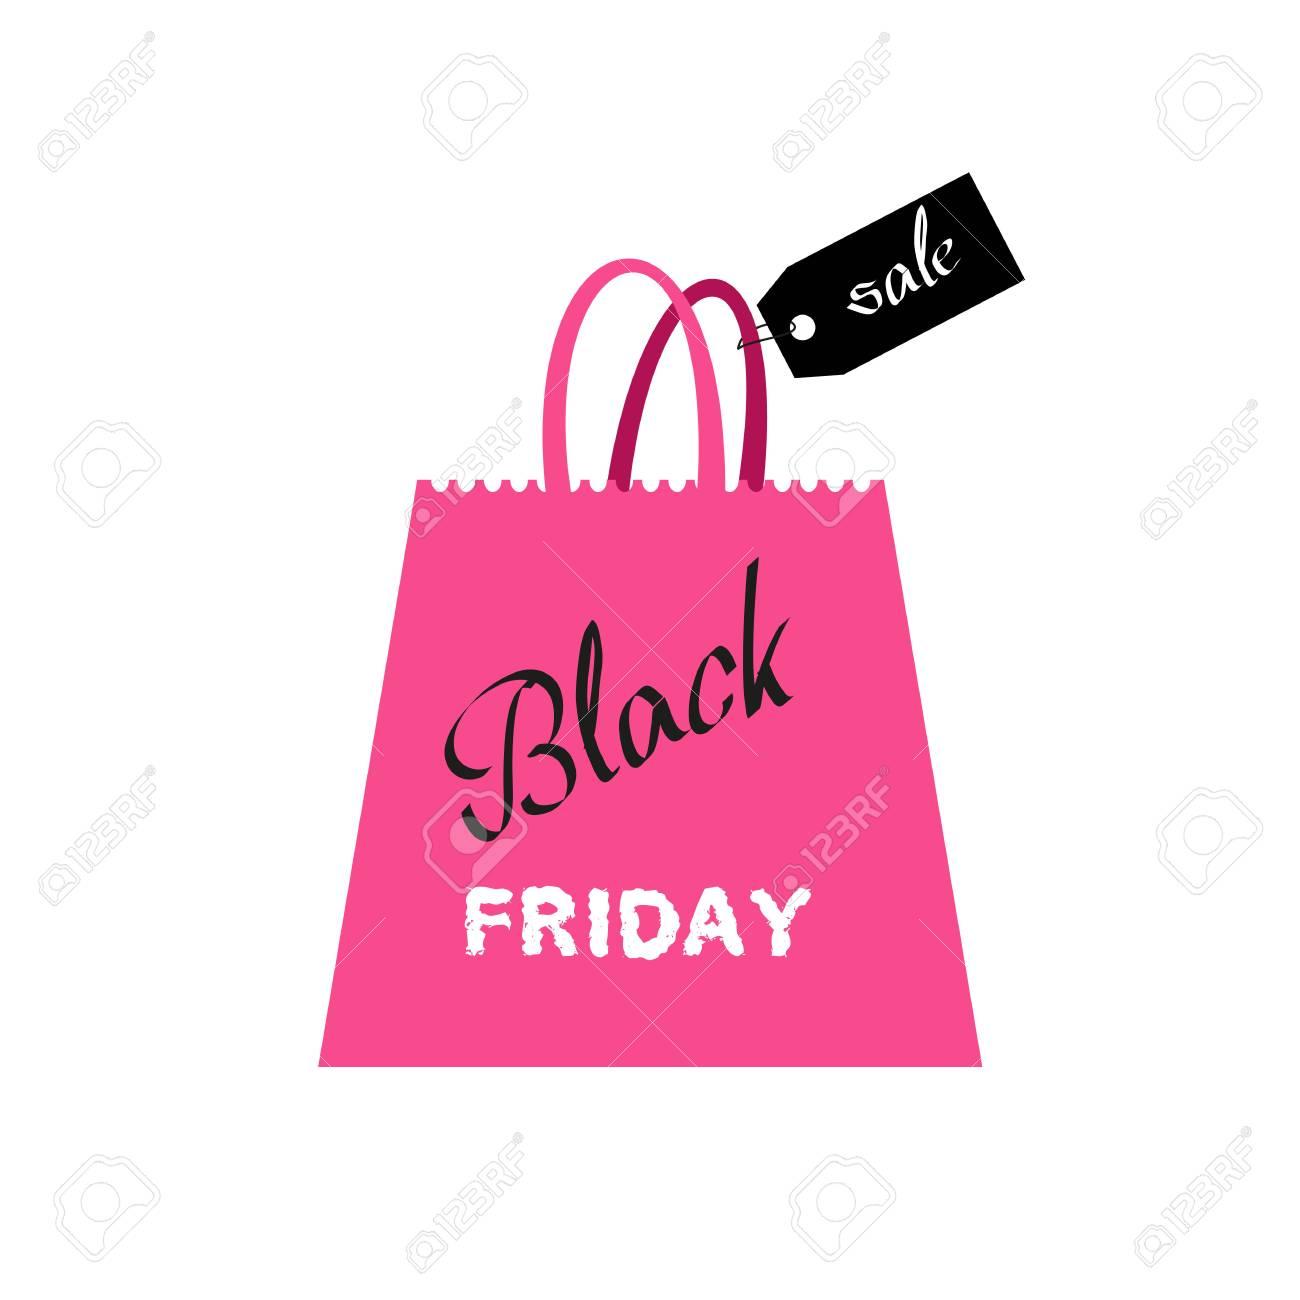 Black friday shopping bag on white background Vector illustration..